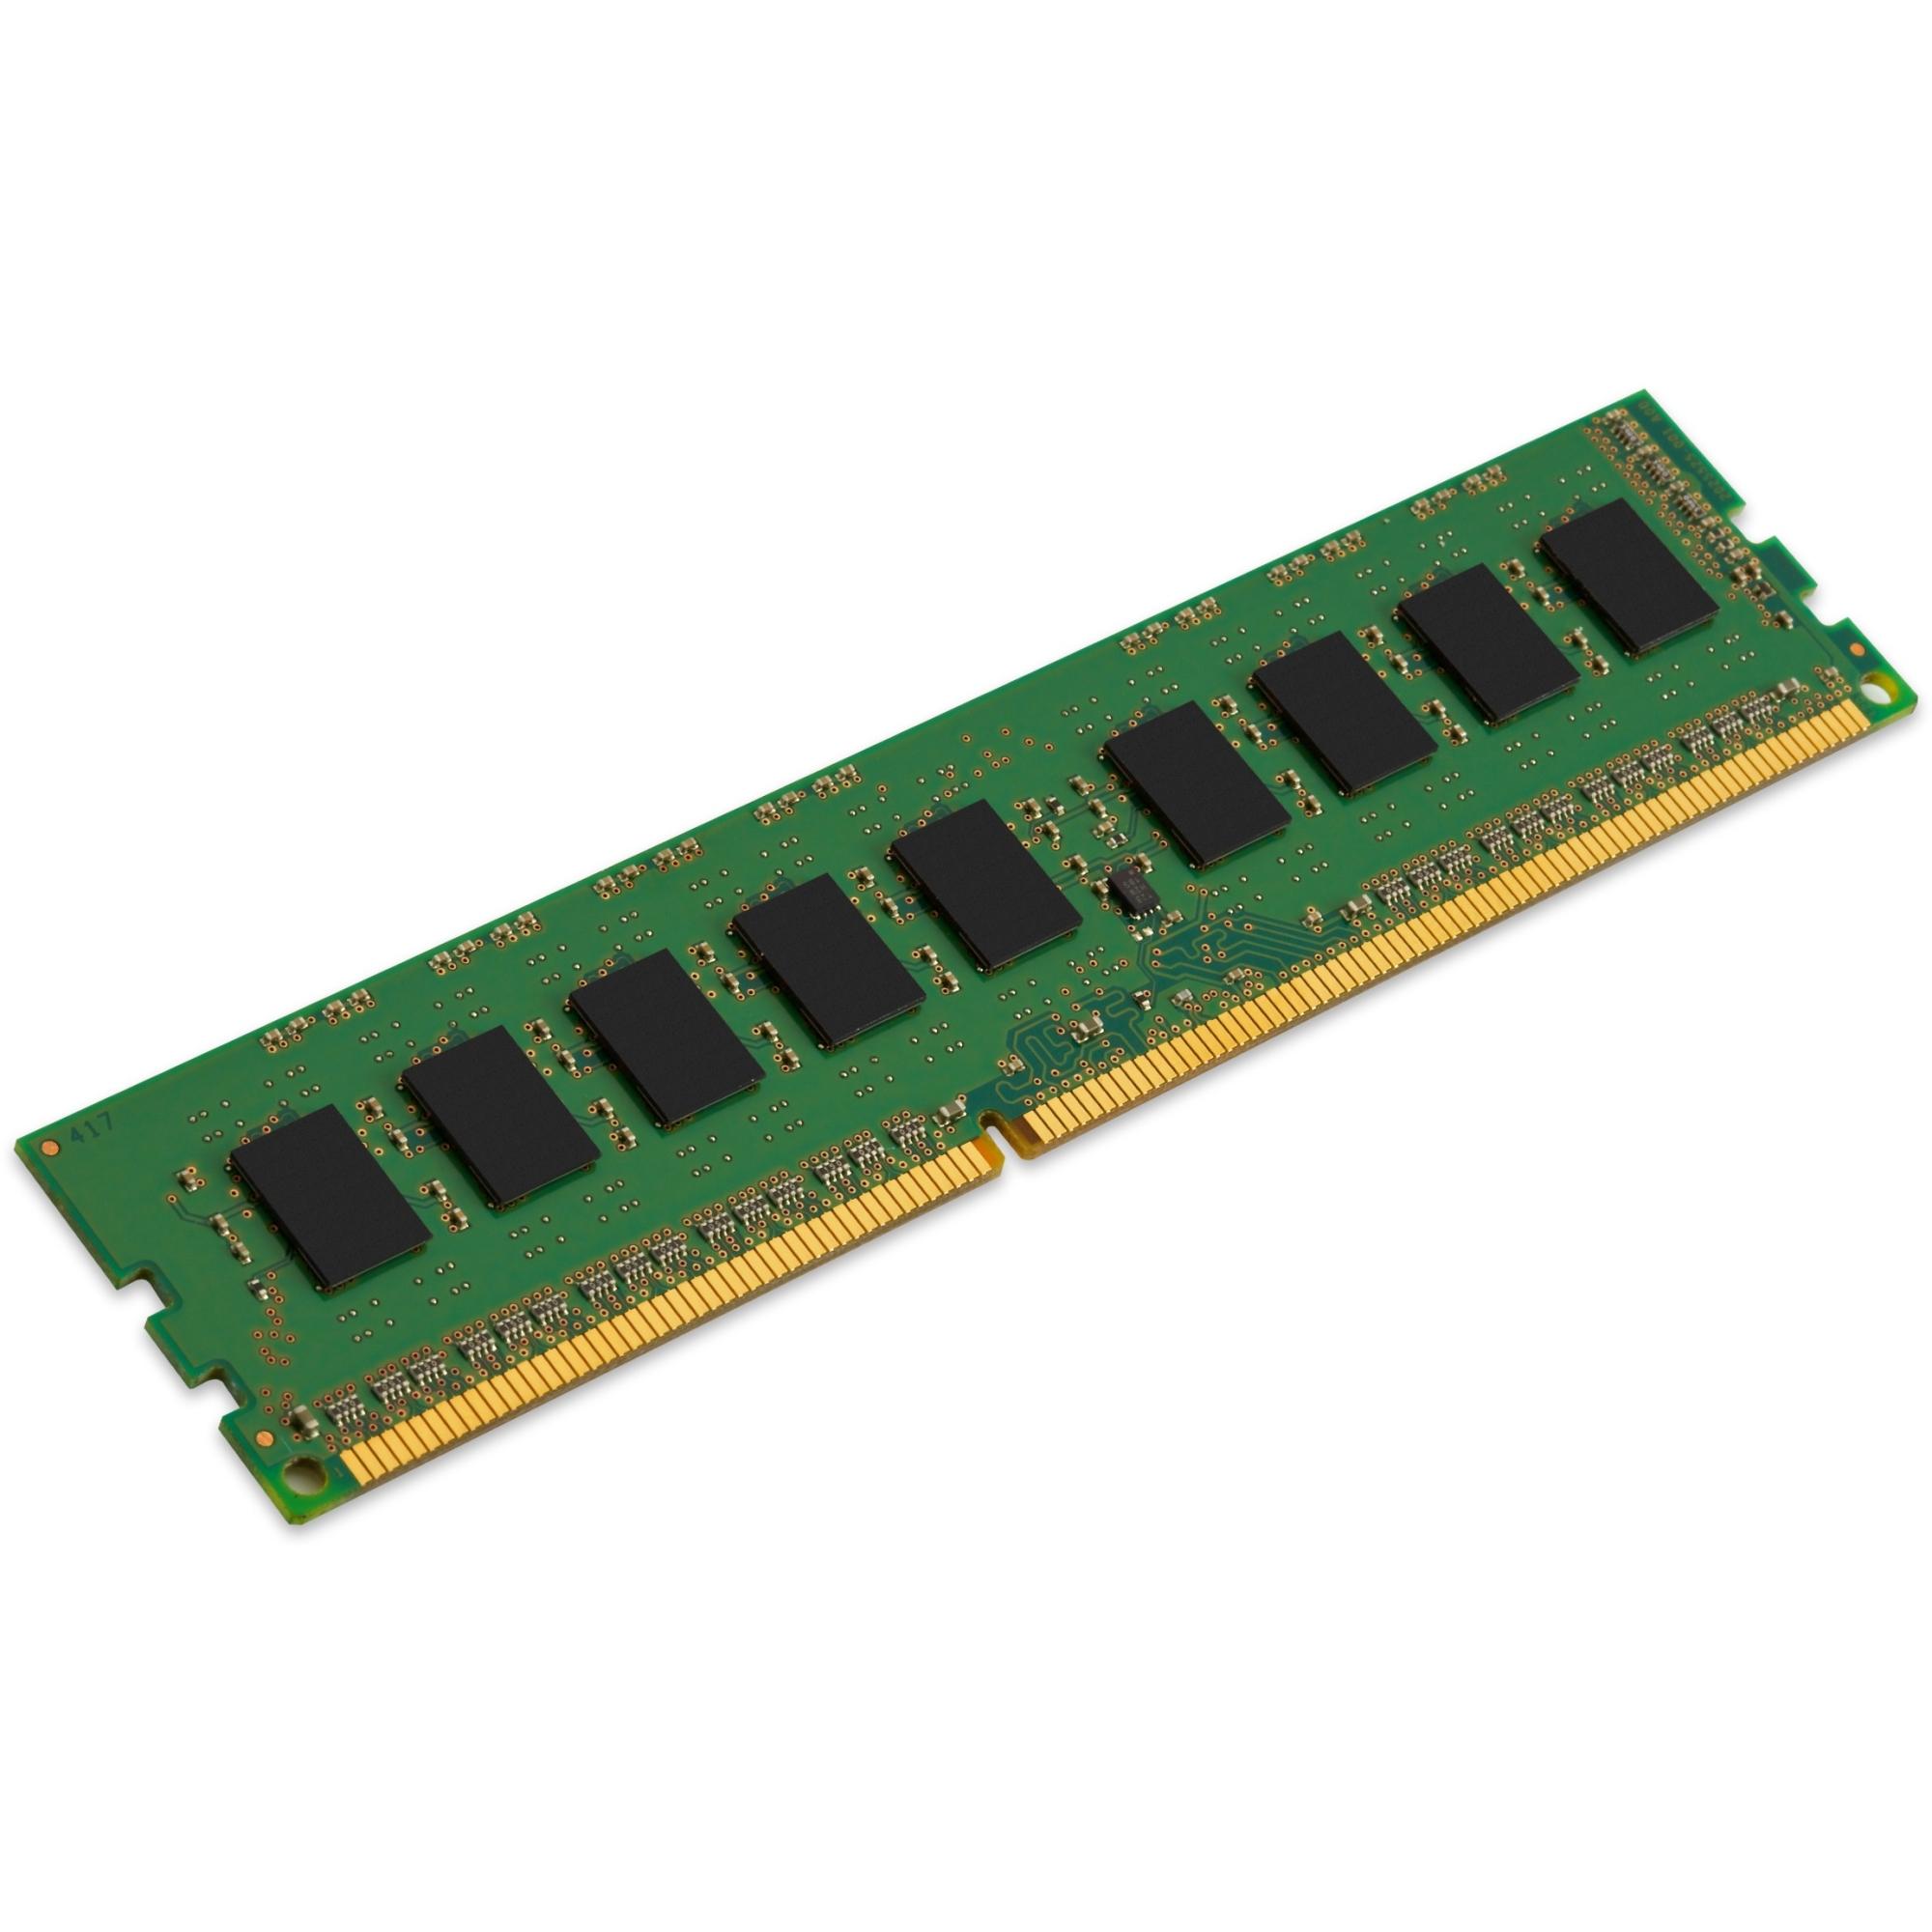 Kingston 8GB (1x8 GB) 1333MHz DDR3 PC3-12800 240-Pin ECC ...